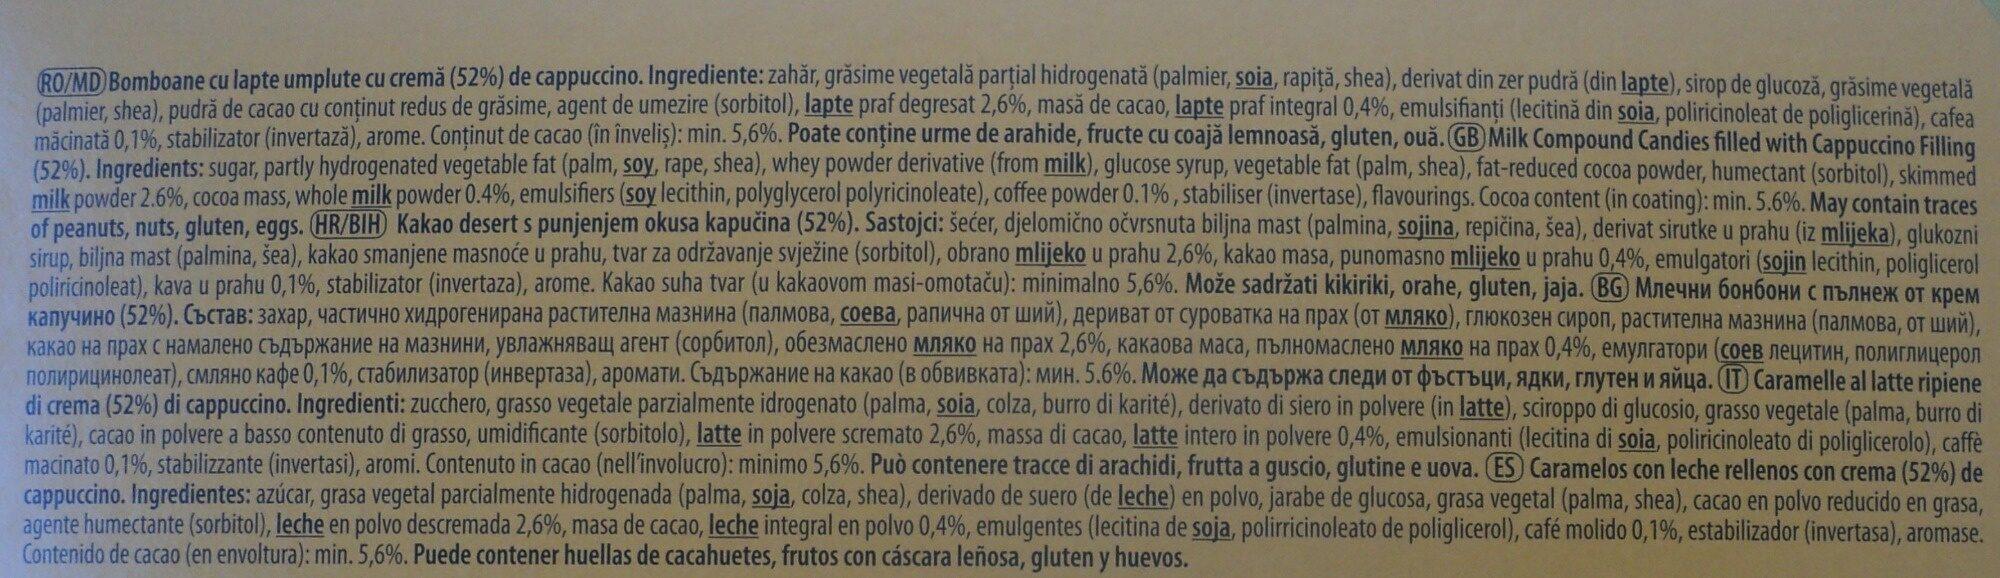 Bomboane cu cremă cappuccino - Ingredients - ro